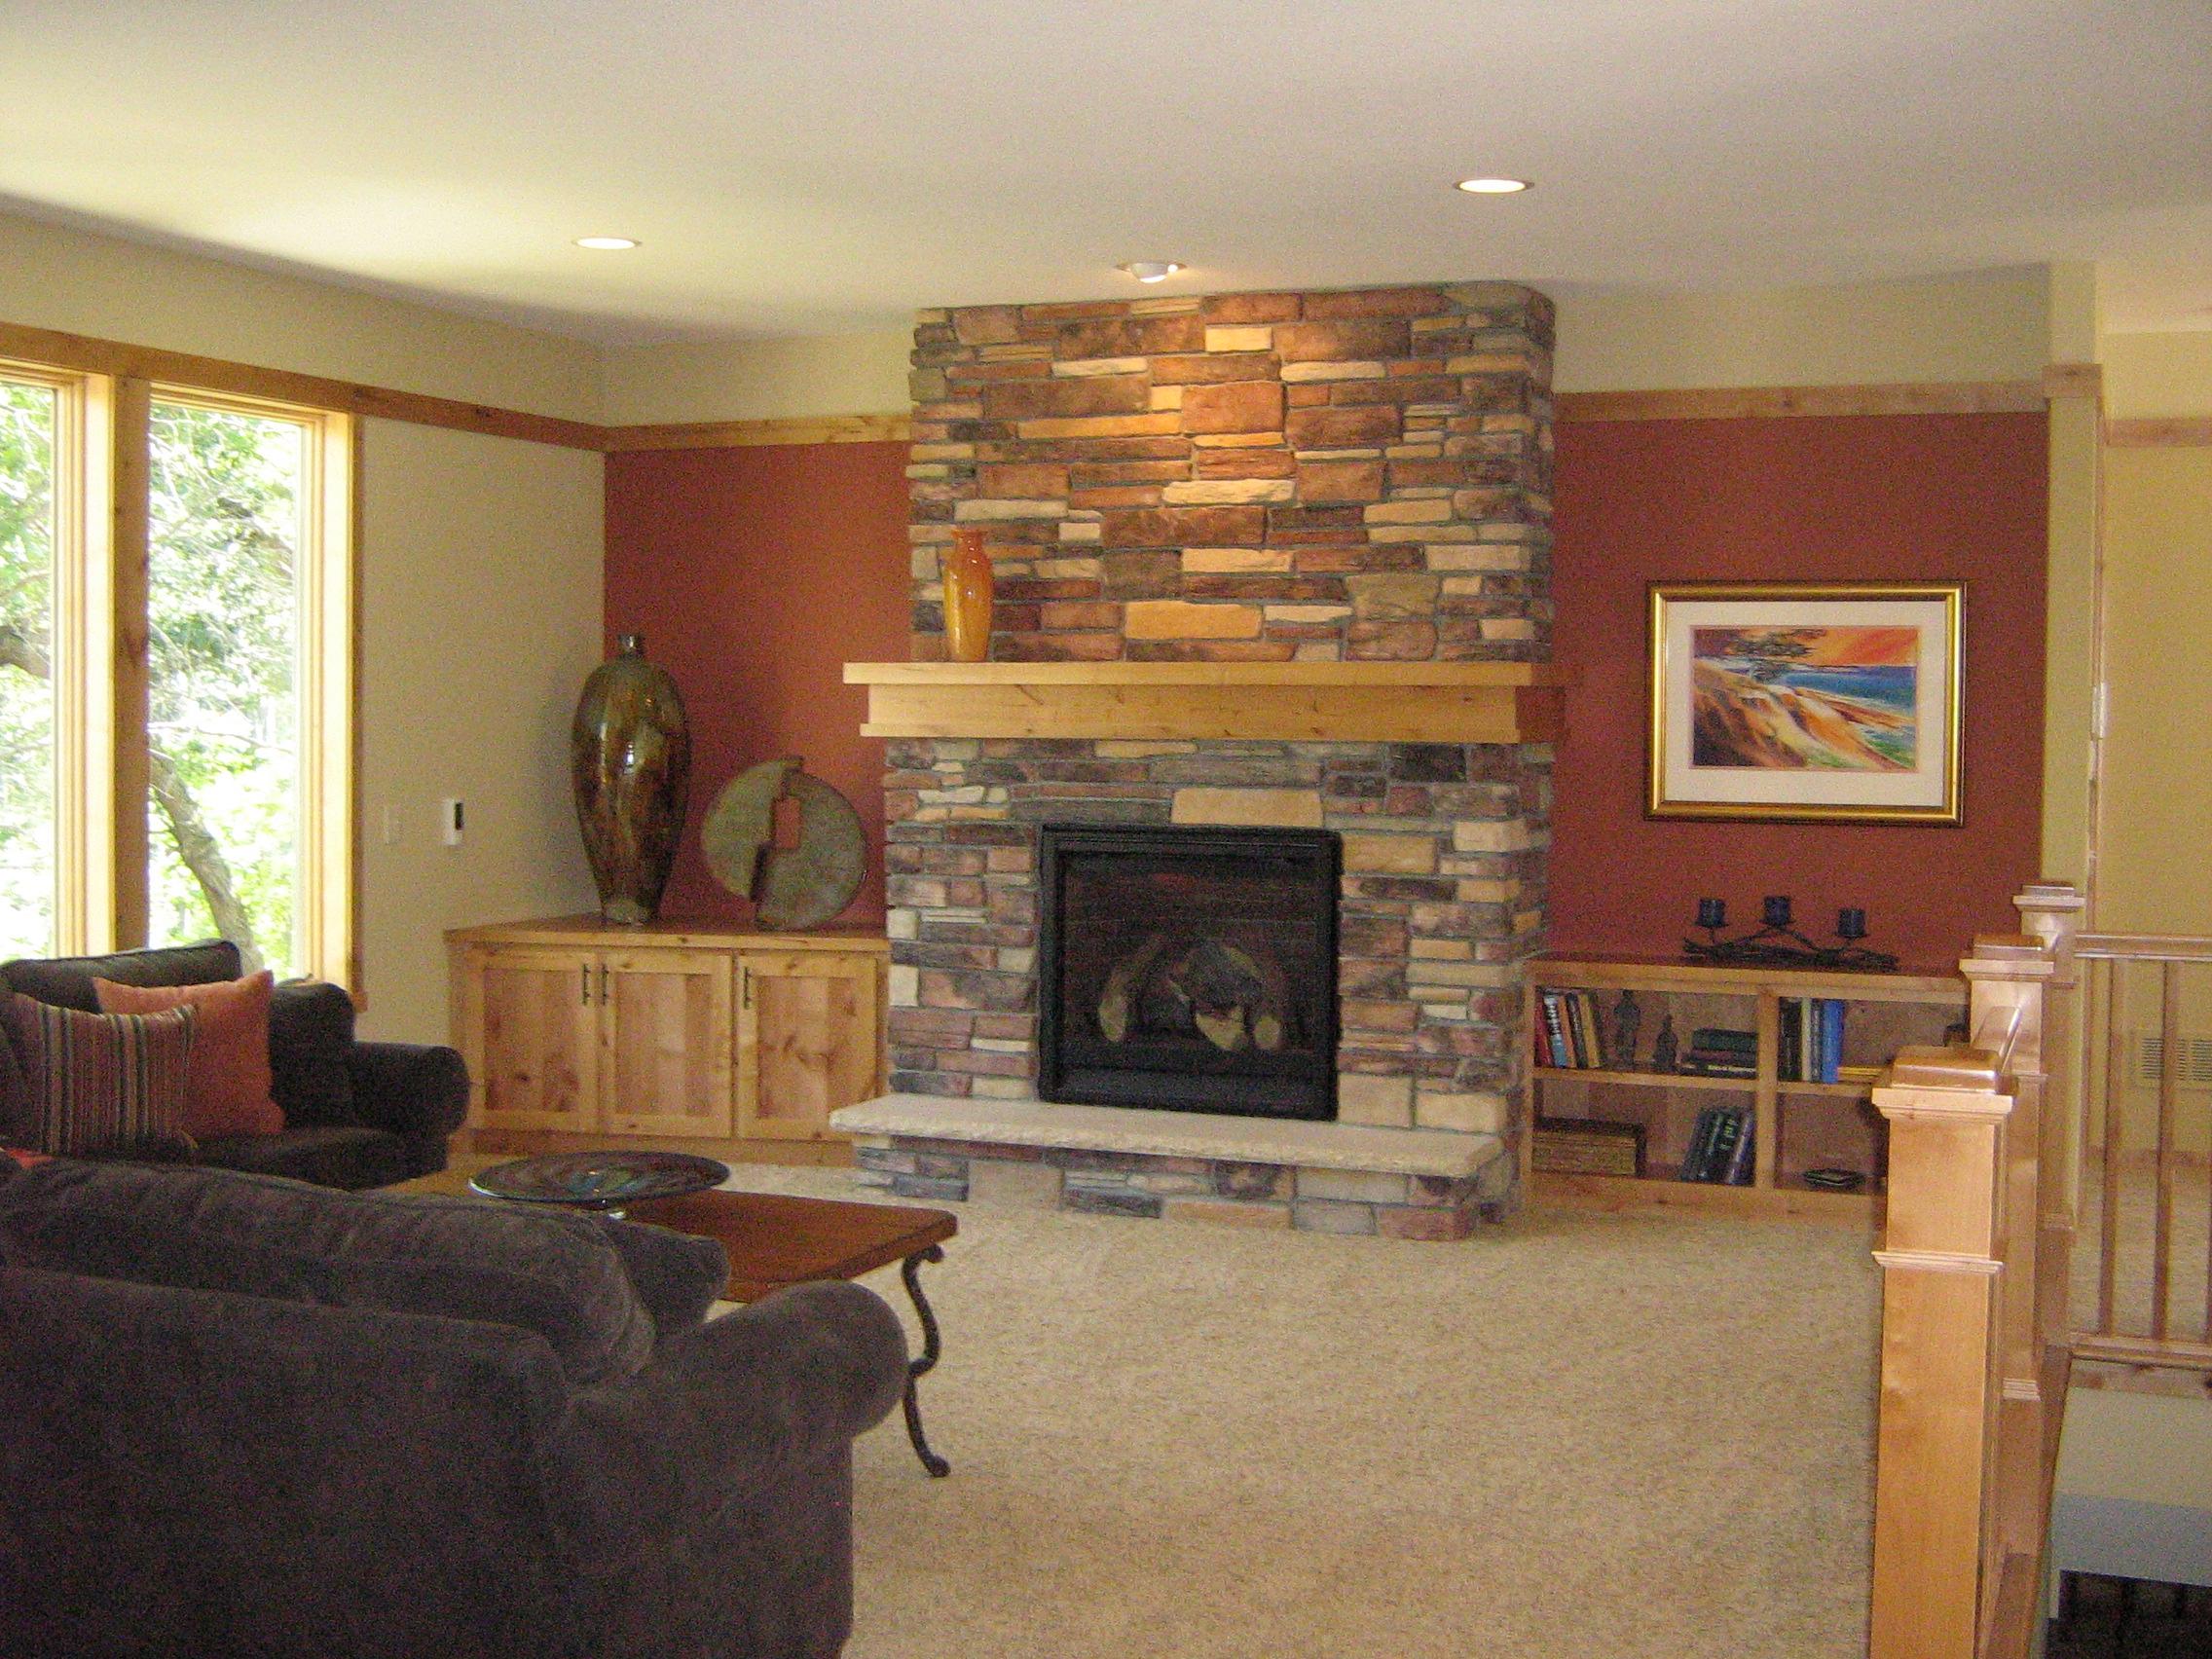 Design Help For Living Room A Living Room With A Sliding